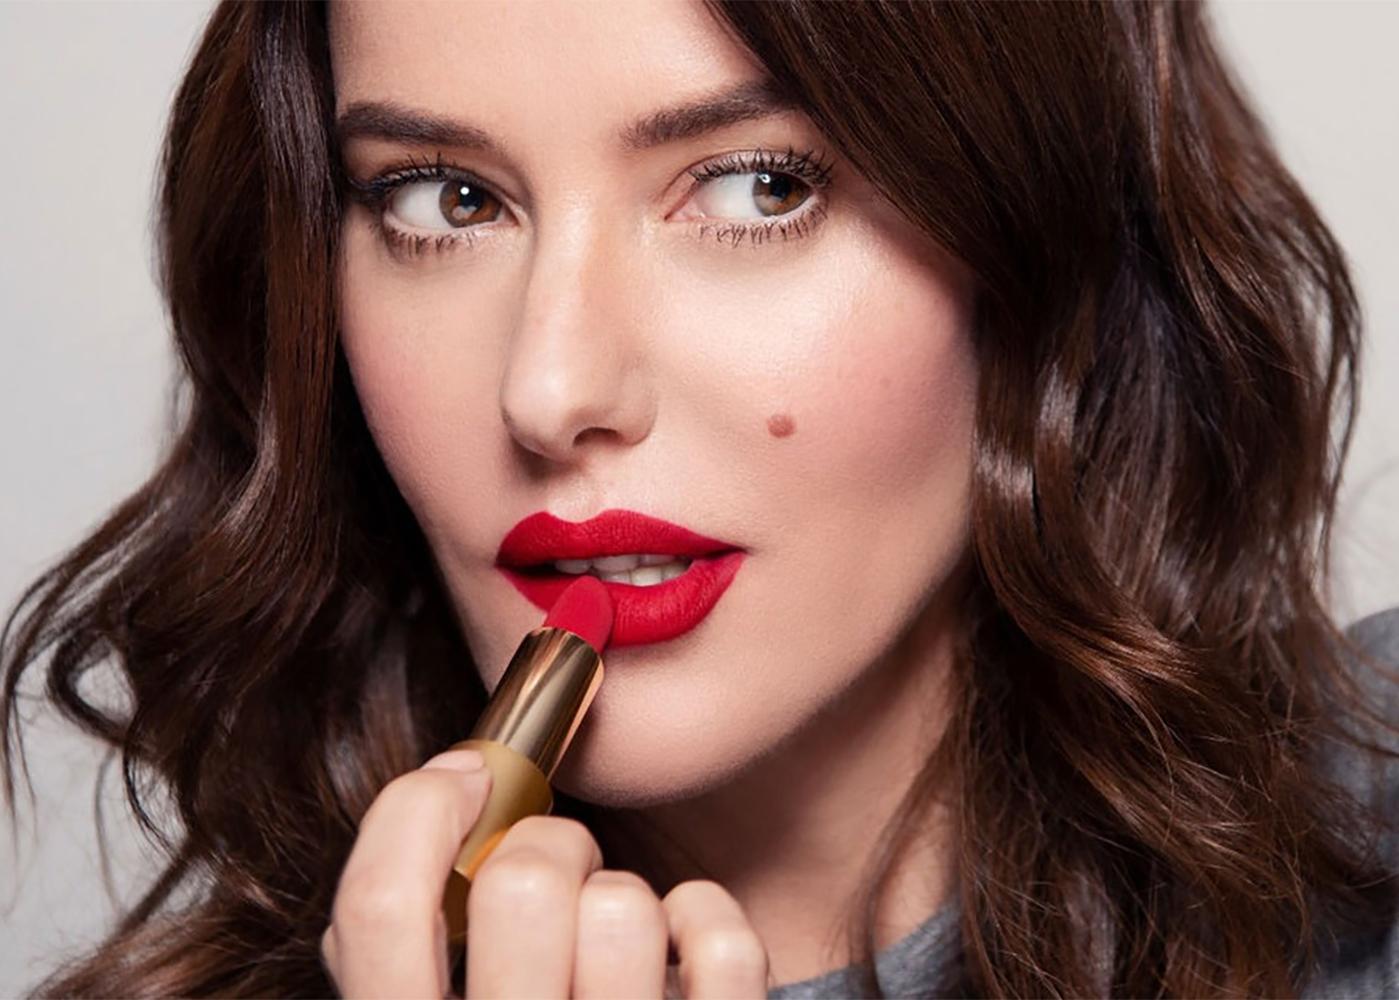 lisa-eldridge-lipsticks-mateusz-sitek.jpg